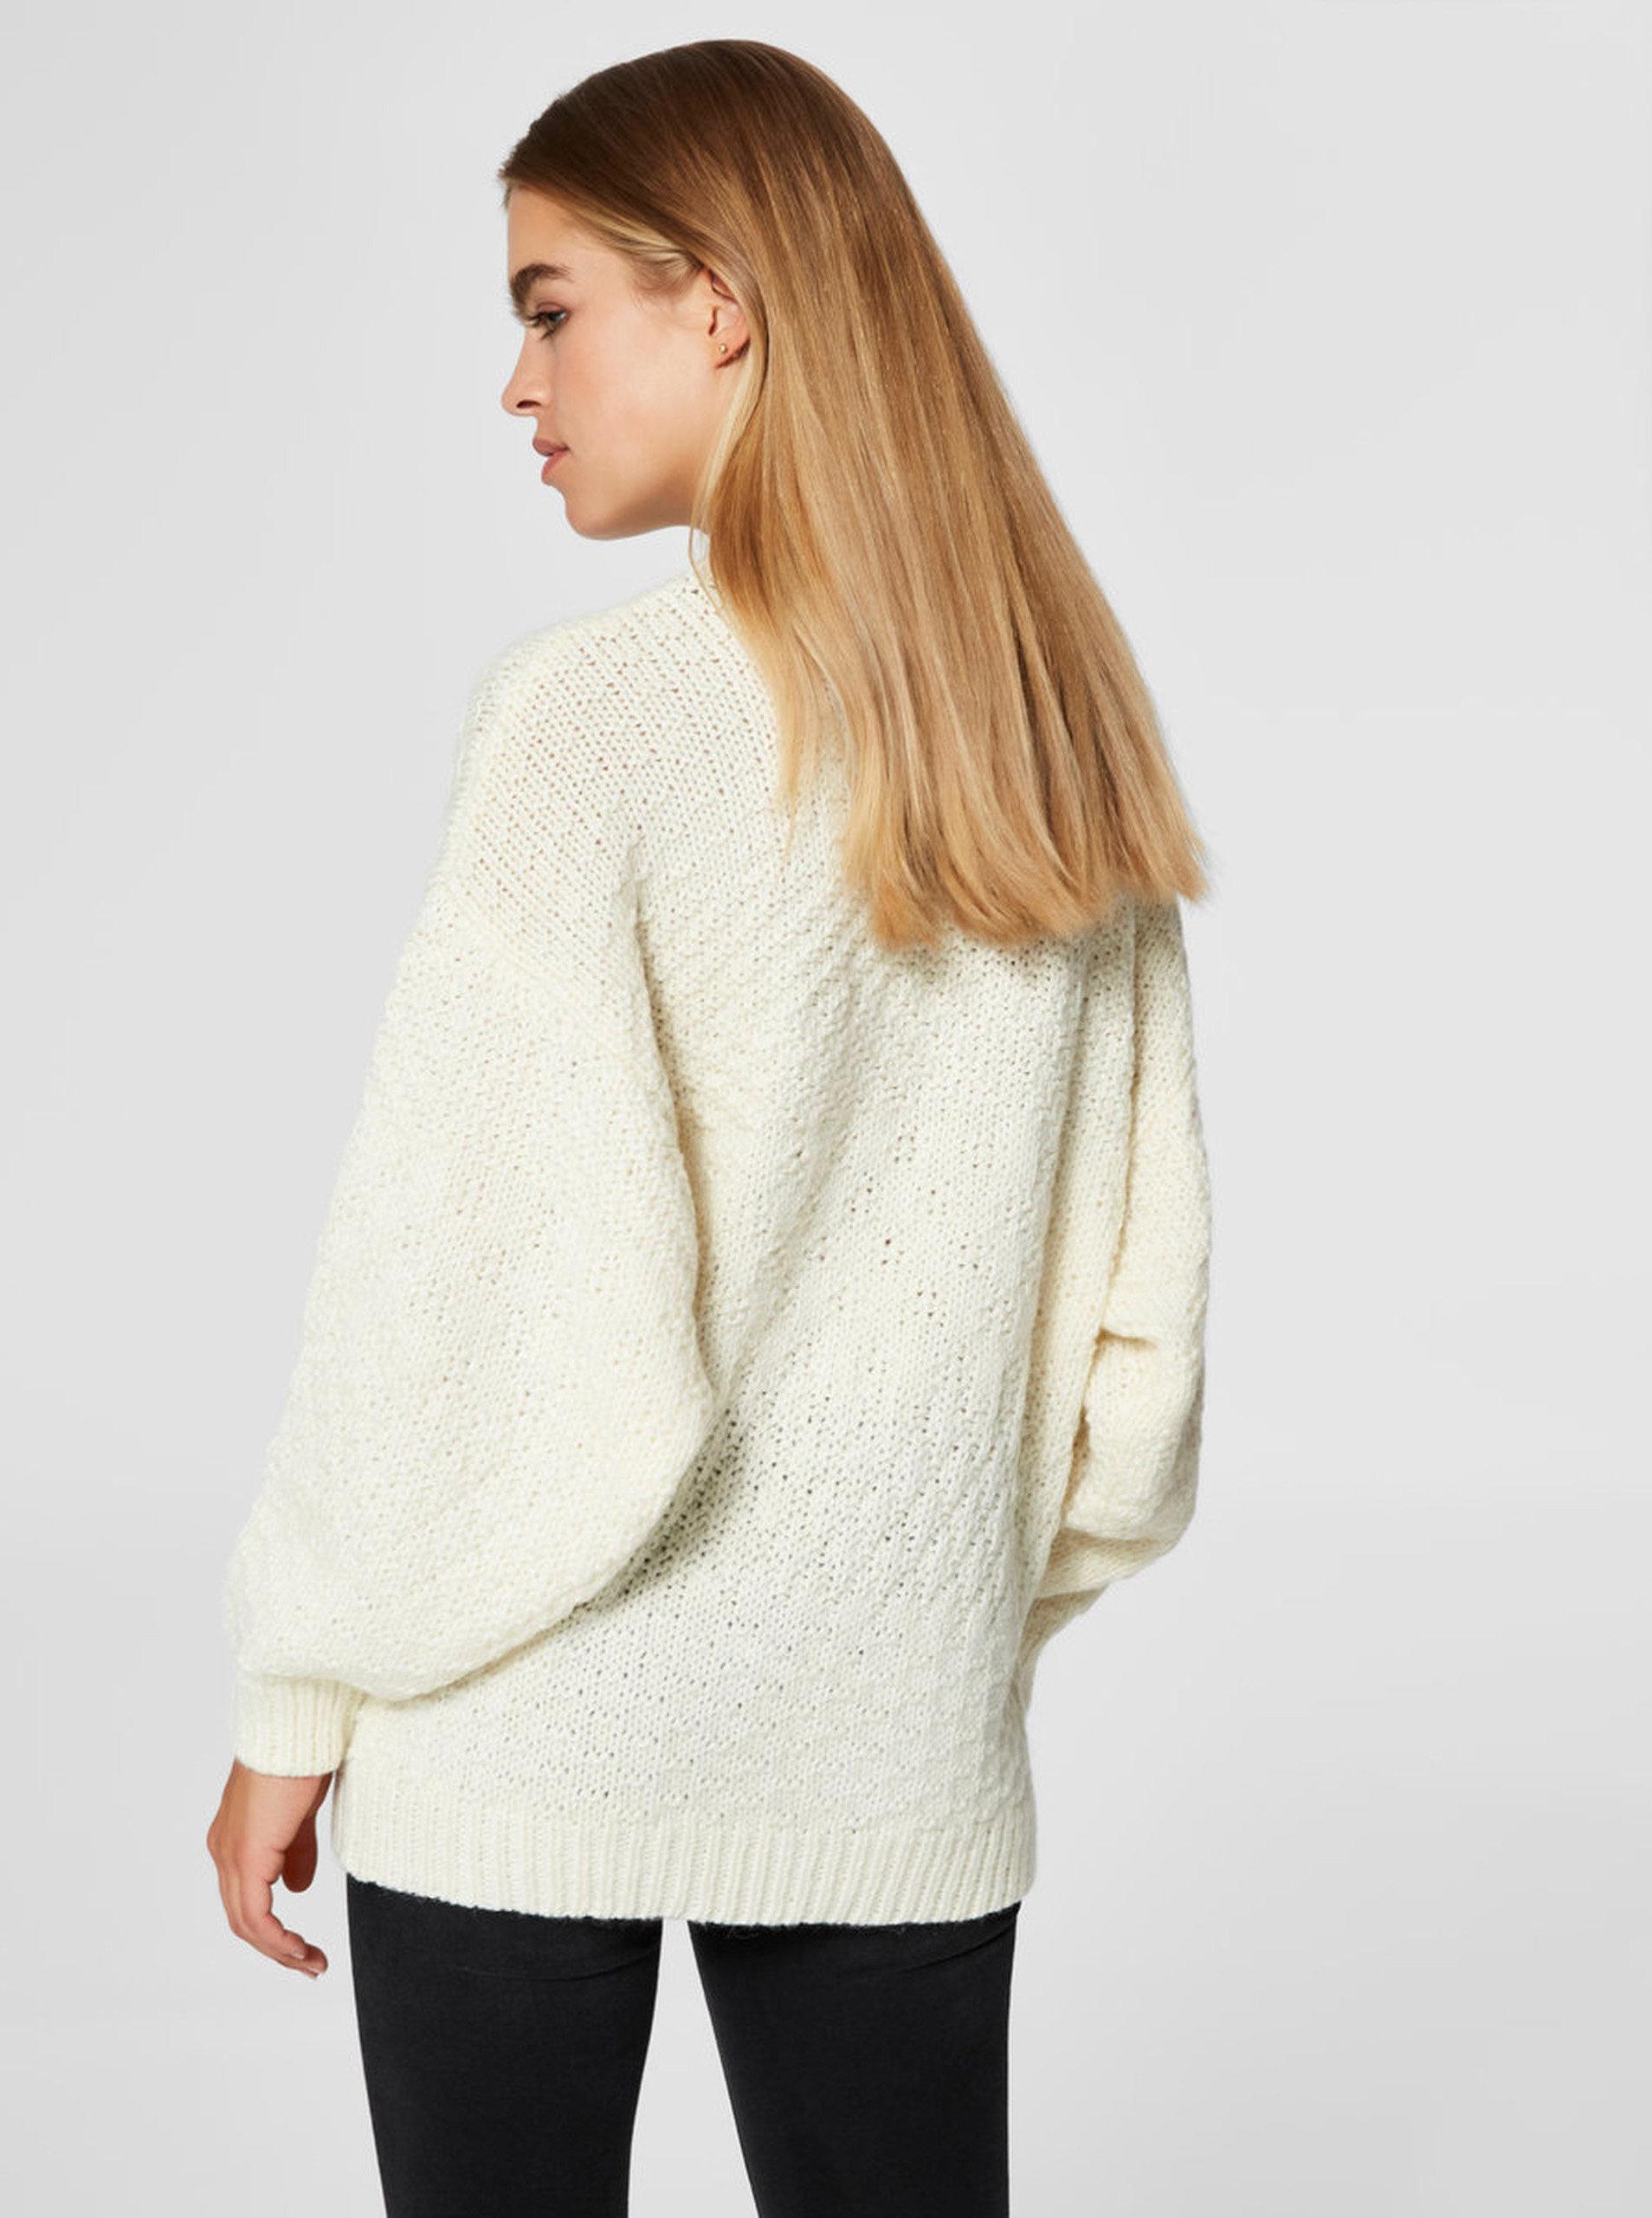 caa86c2587d8 Krémový sveter s prímesou vlny Selected Femme Hilla ...